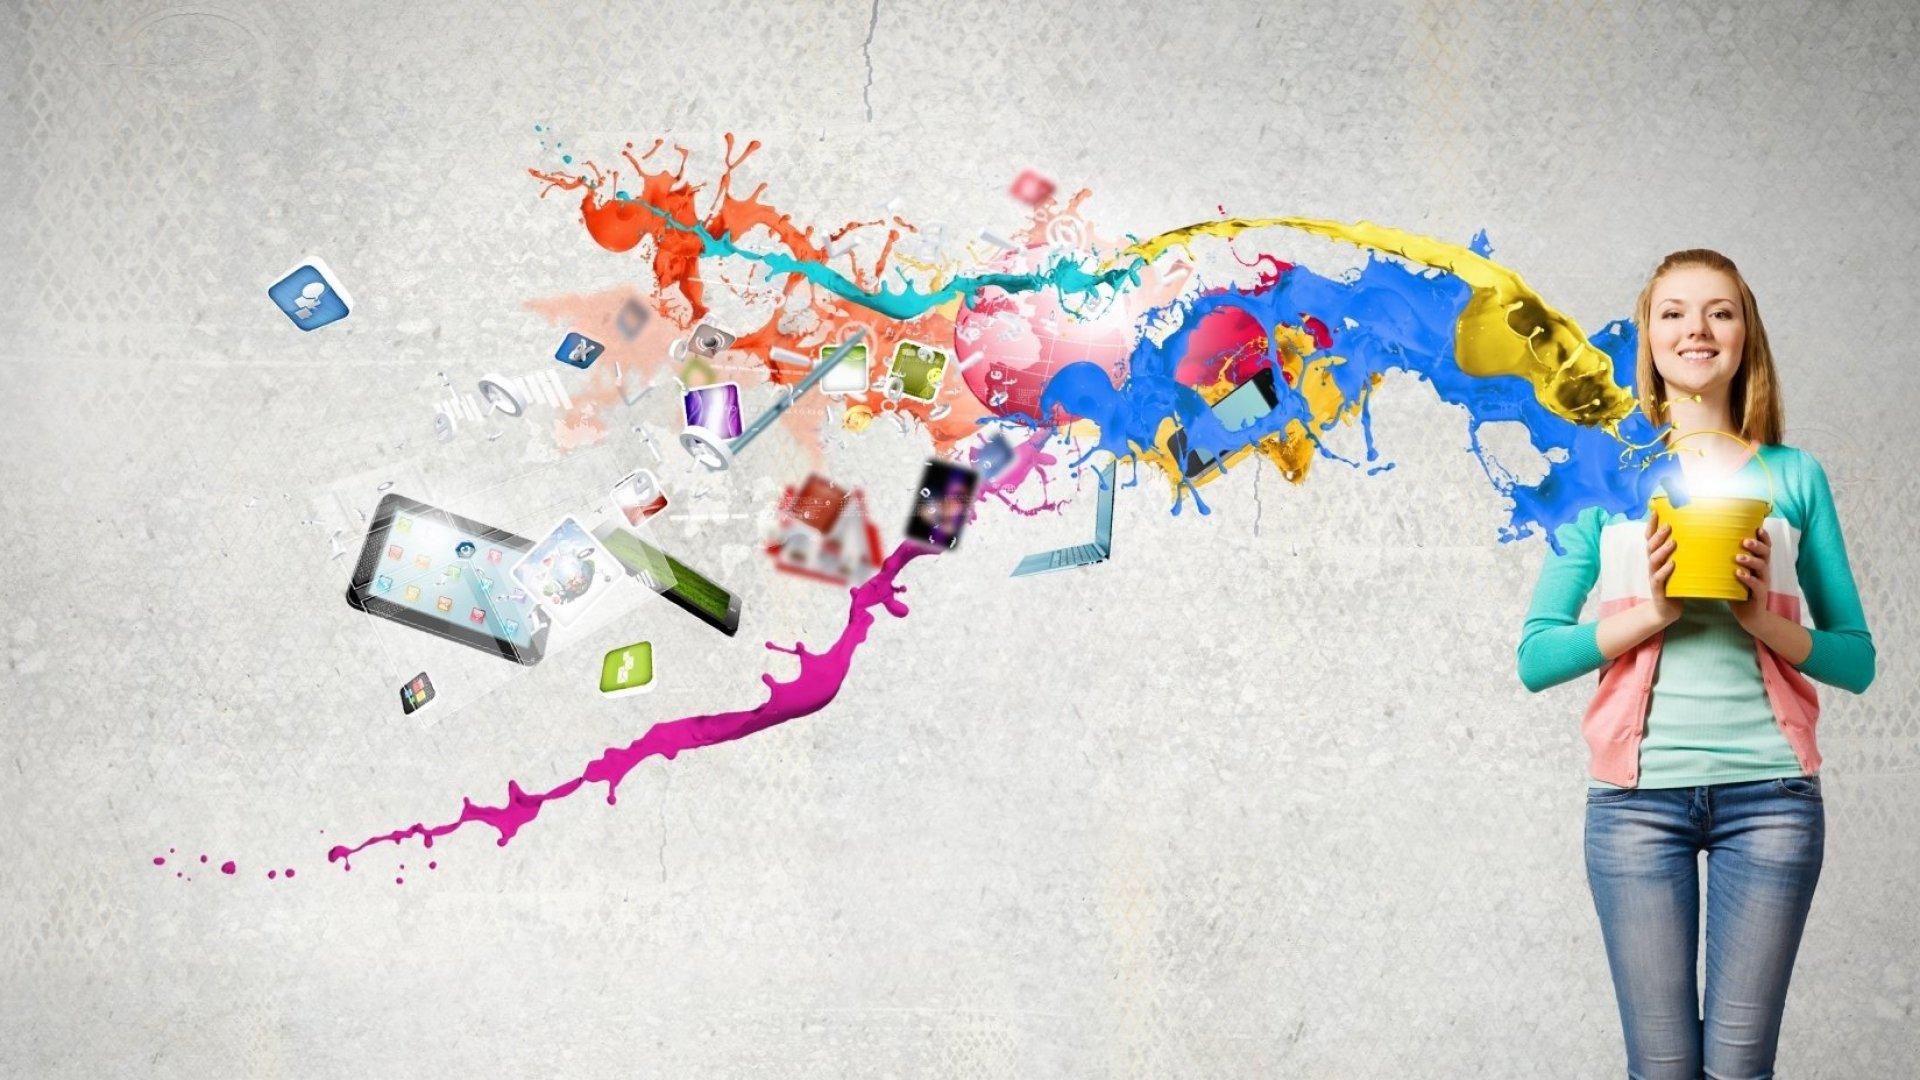 Neuroscience Has Discovered the Secret of Creativity